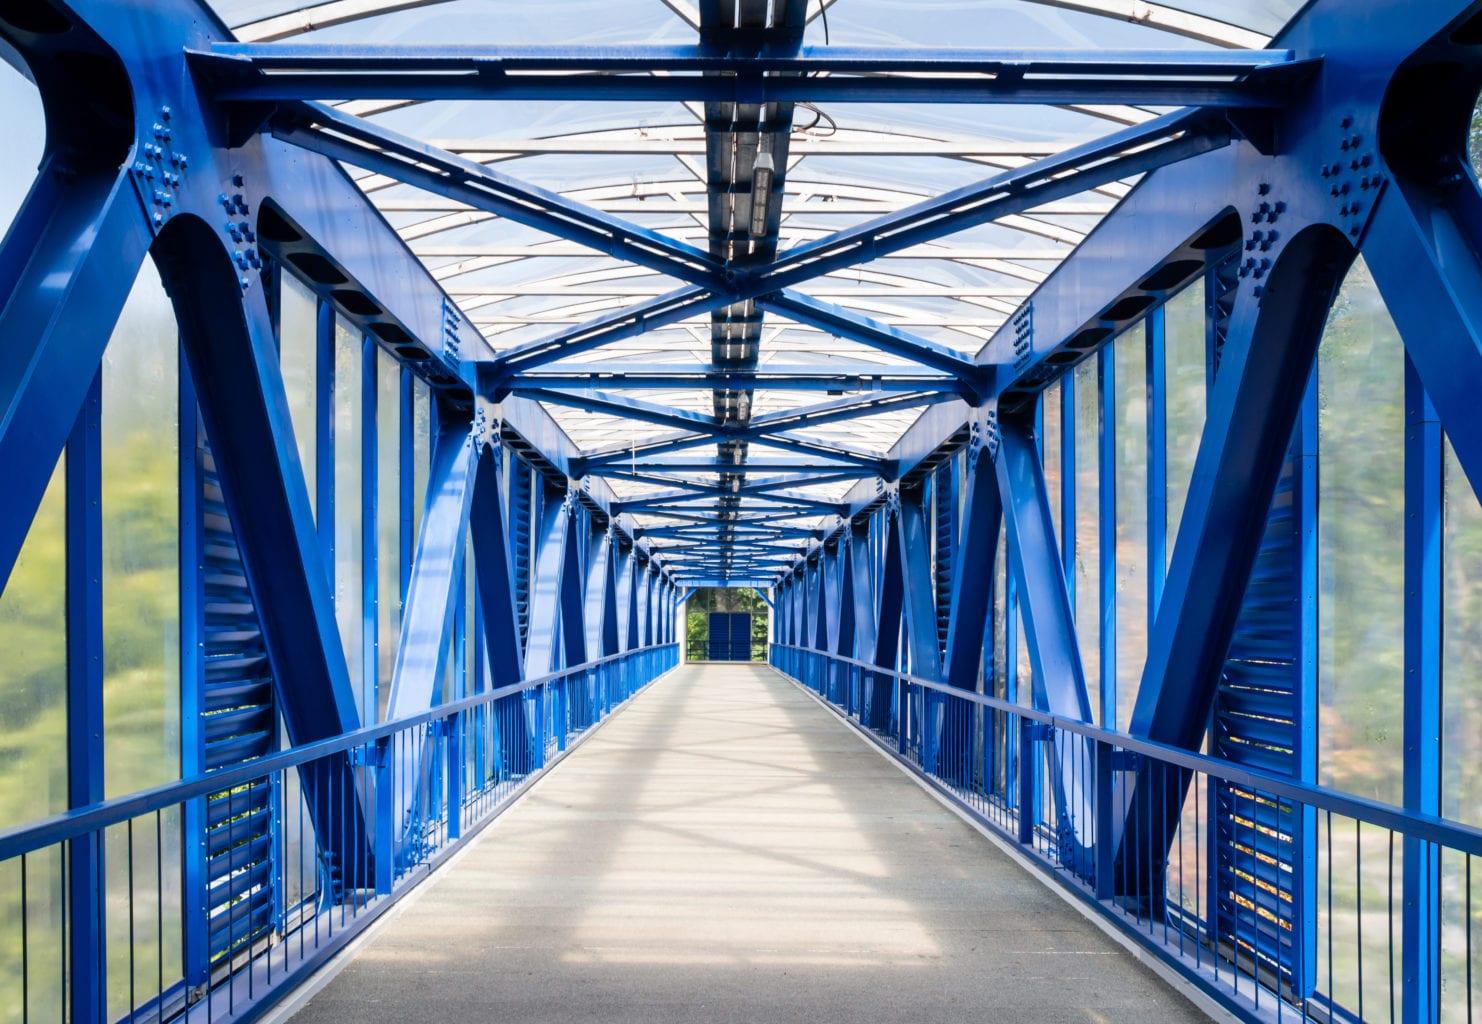 Interior of empty metallic elevated footbridge in the Moscow city.